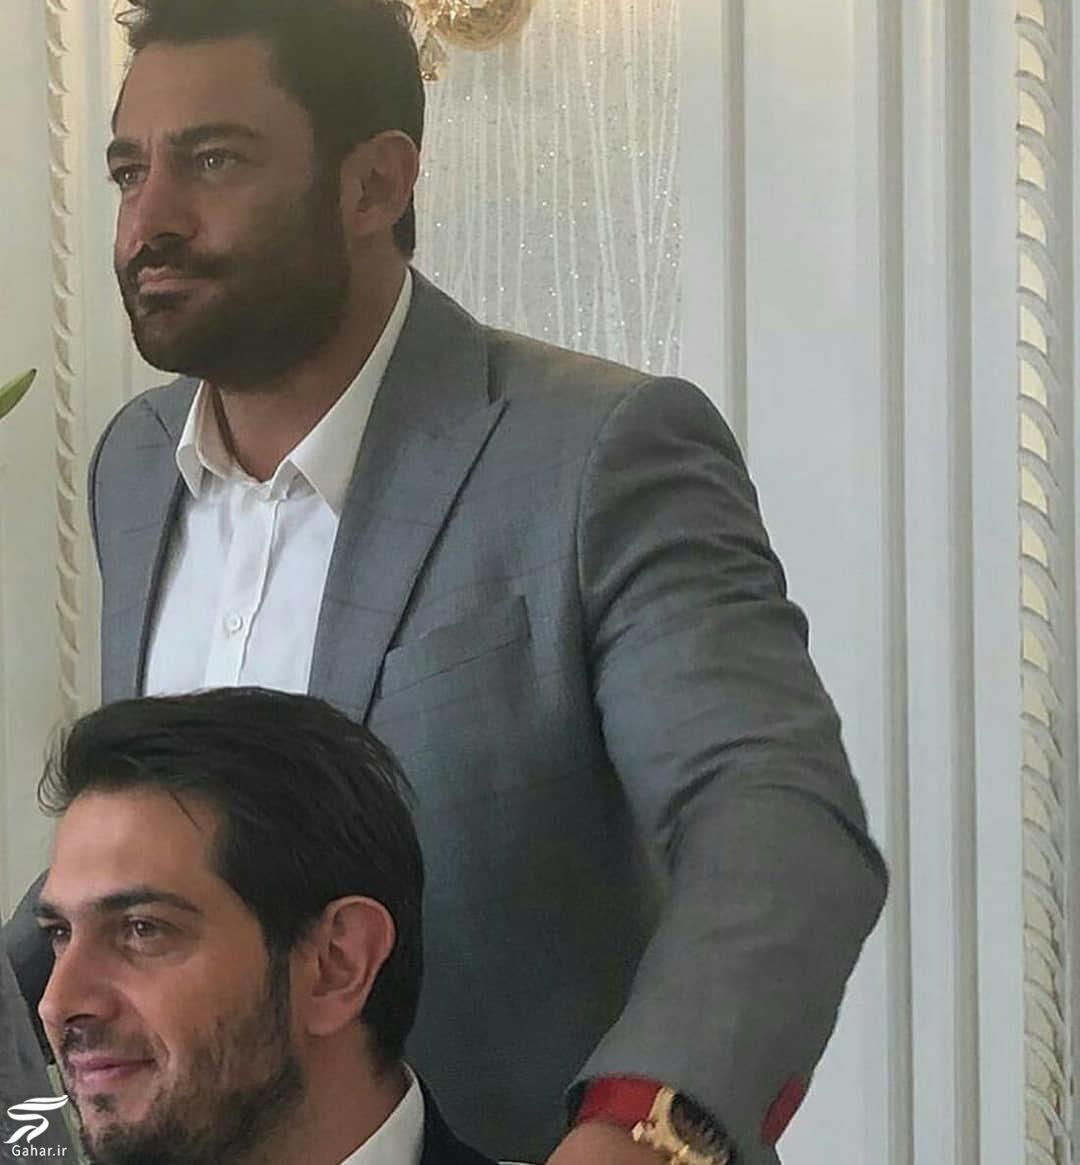 471298 Gahar ir عکسهای محمدرضا گلزار در مراسم عقد برادرش